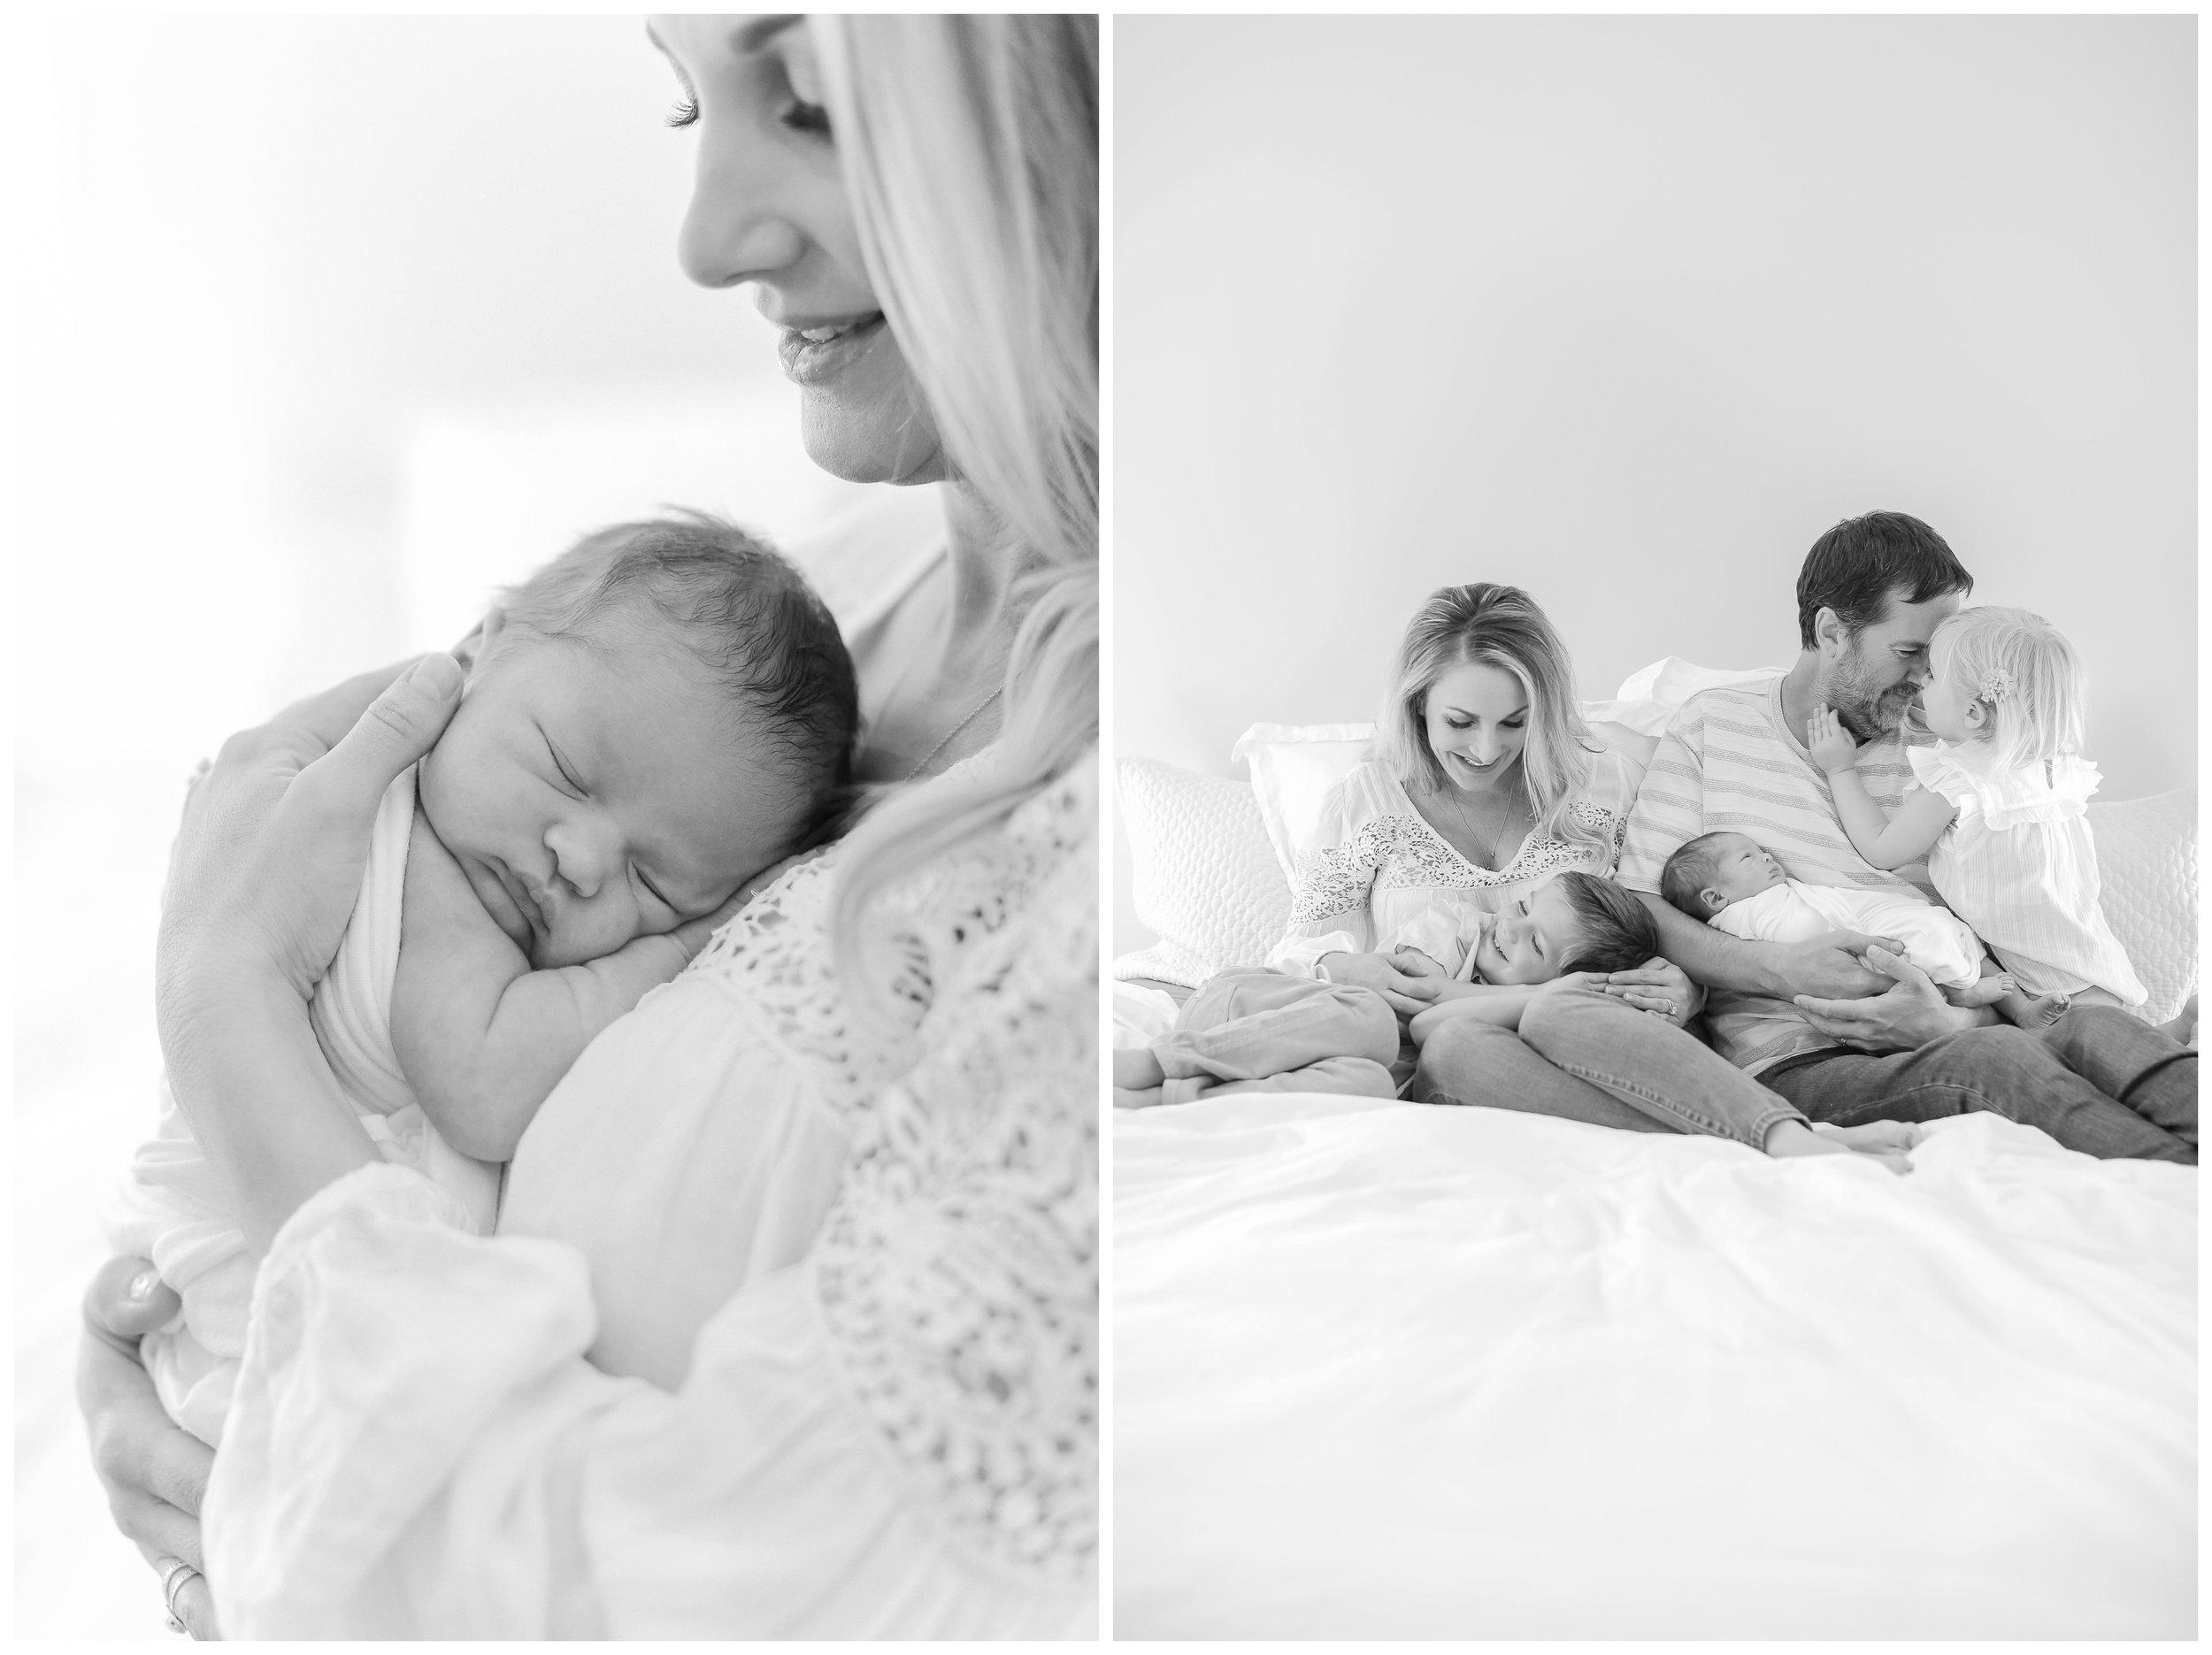 Family-Session_in-home-Orange_county_family_and_newborn-photographer_cori_kleckner_photography_Newport_beach_family_photographer__0808.jpg